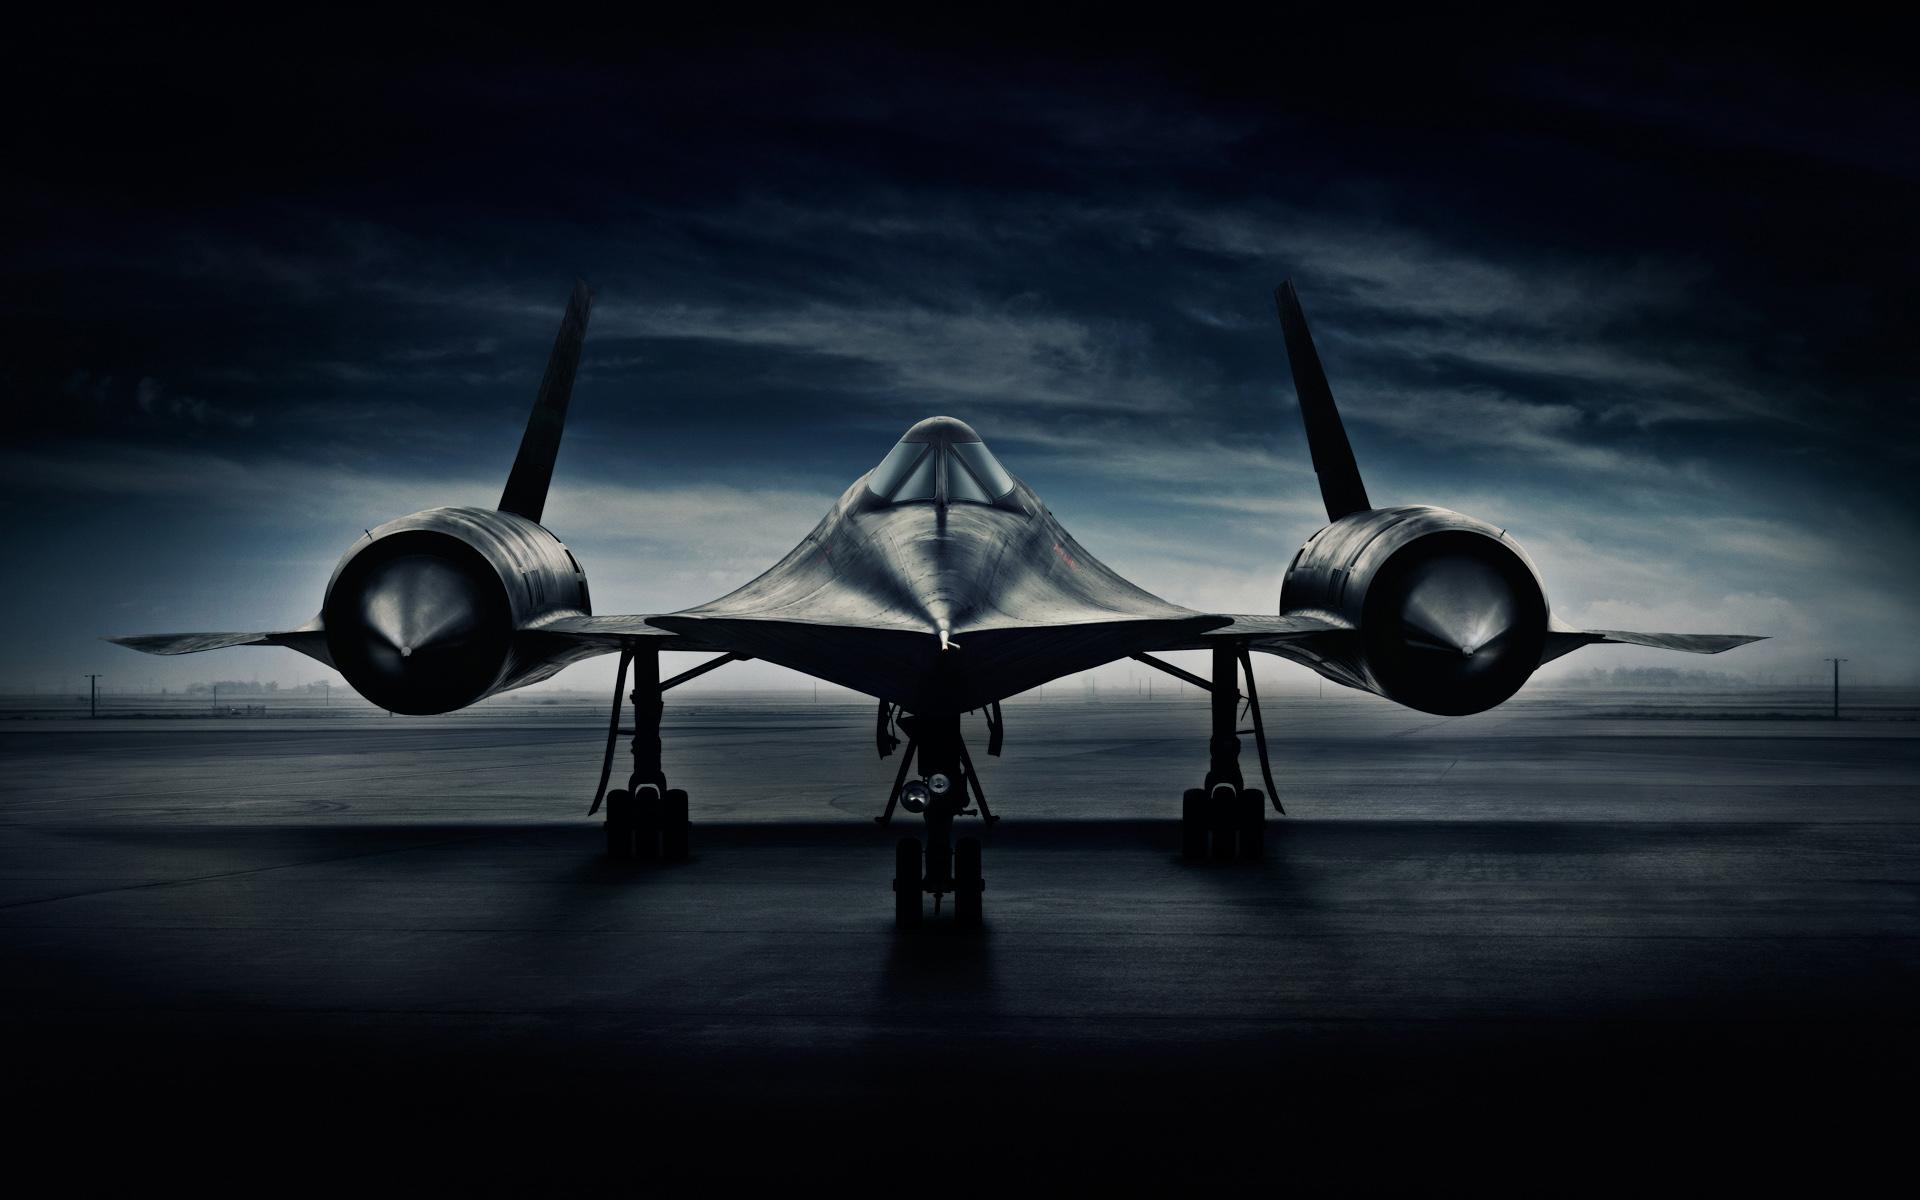 Wallpaper Lockheed Sr 71 Blackbird Airplane Military